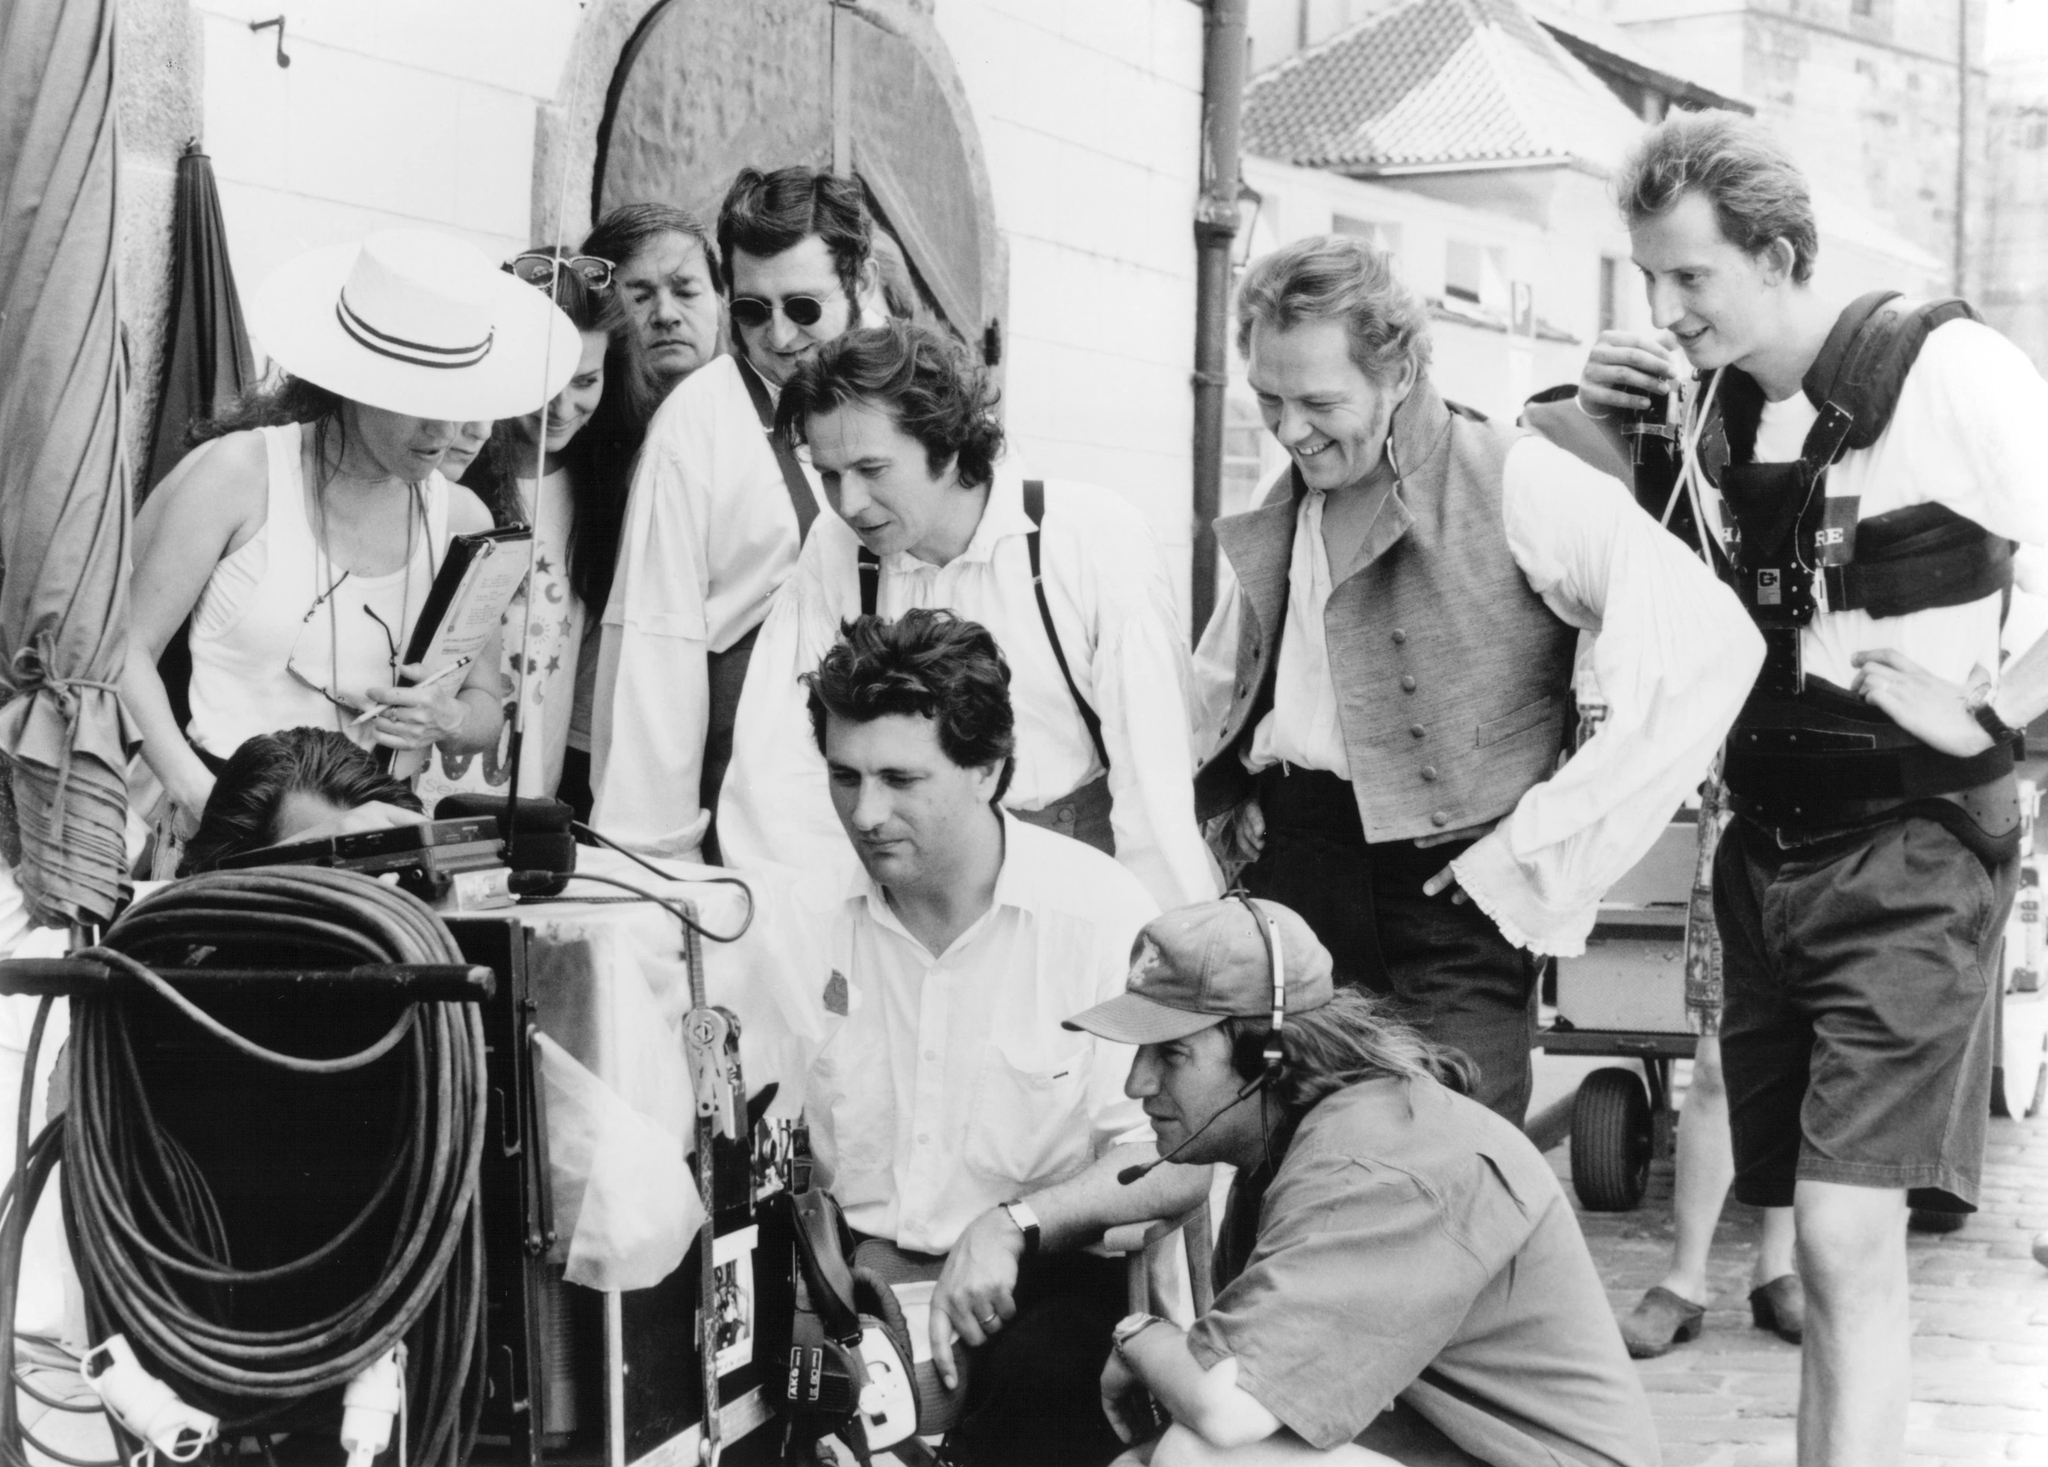 Gary Oldman, Christopher Fulford, Gerard Horan, and Bernard Rose in Immortal Beloved (1994)